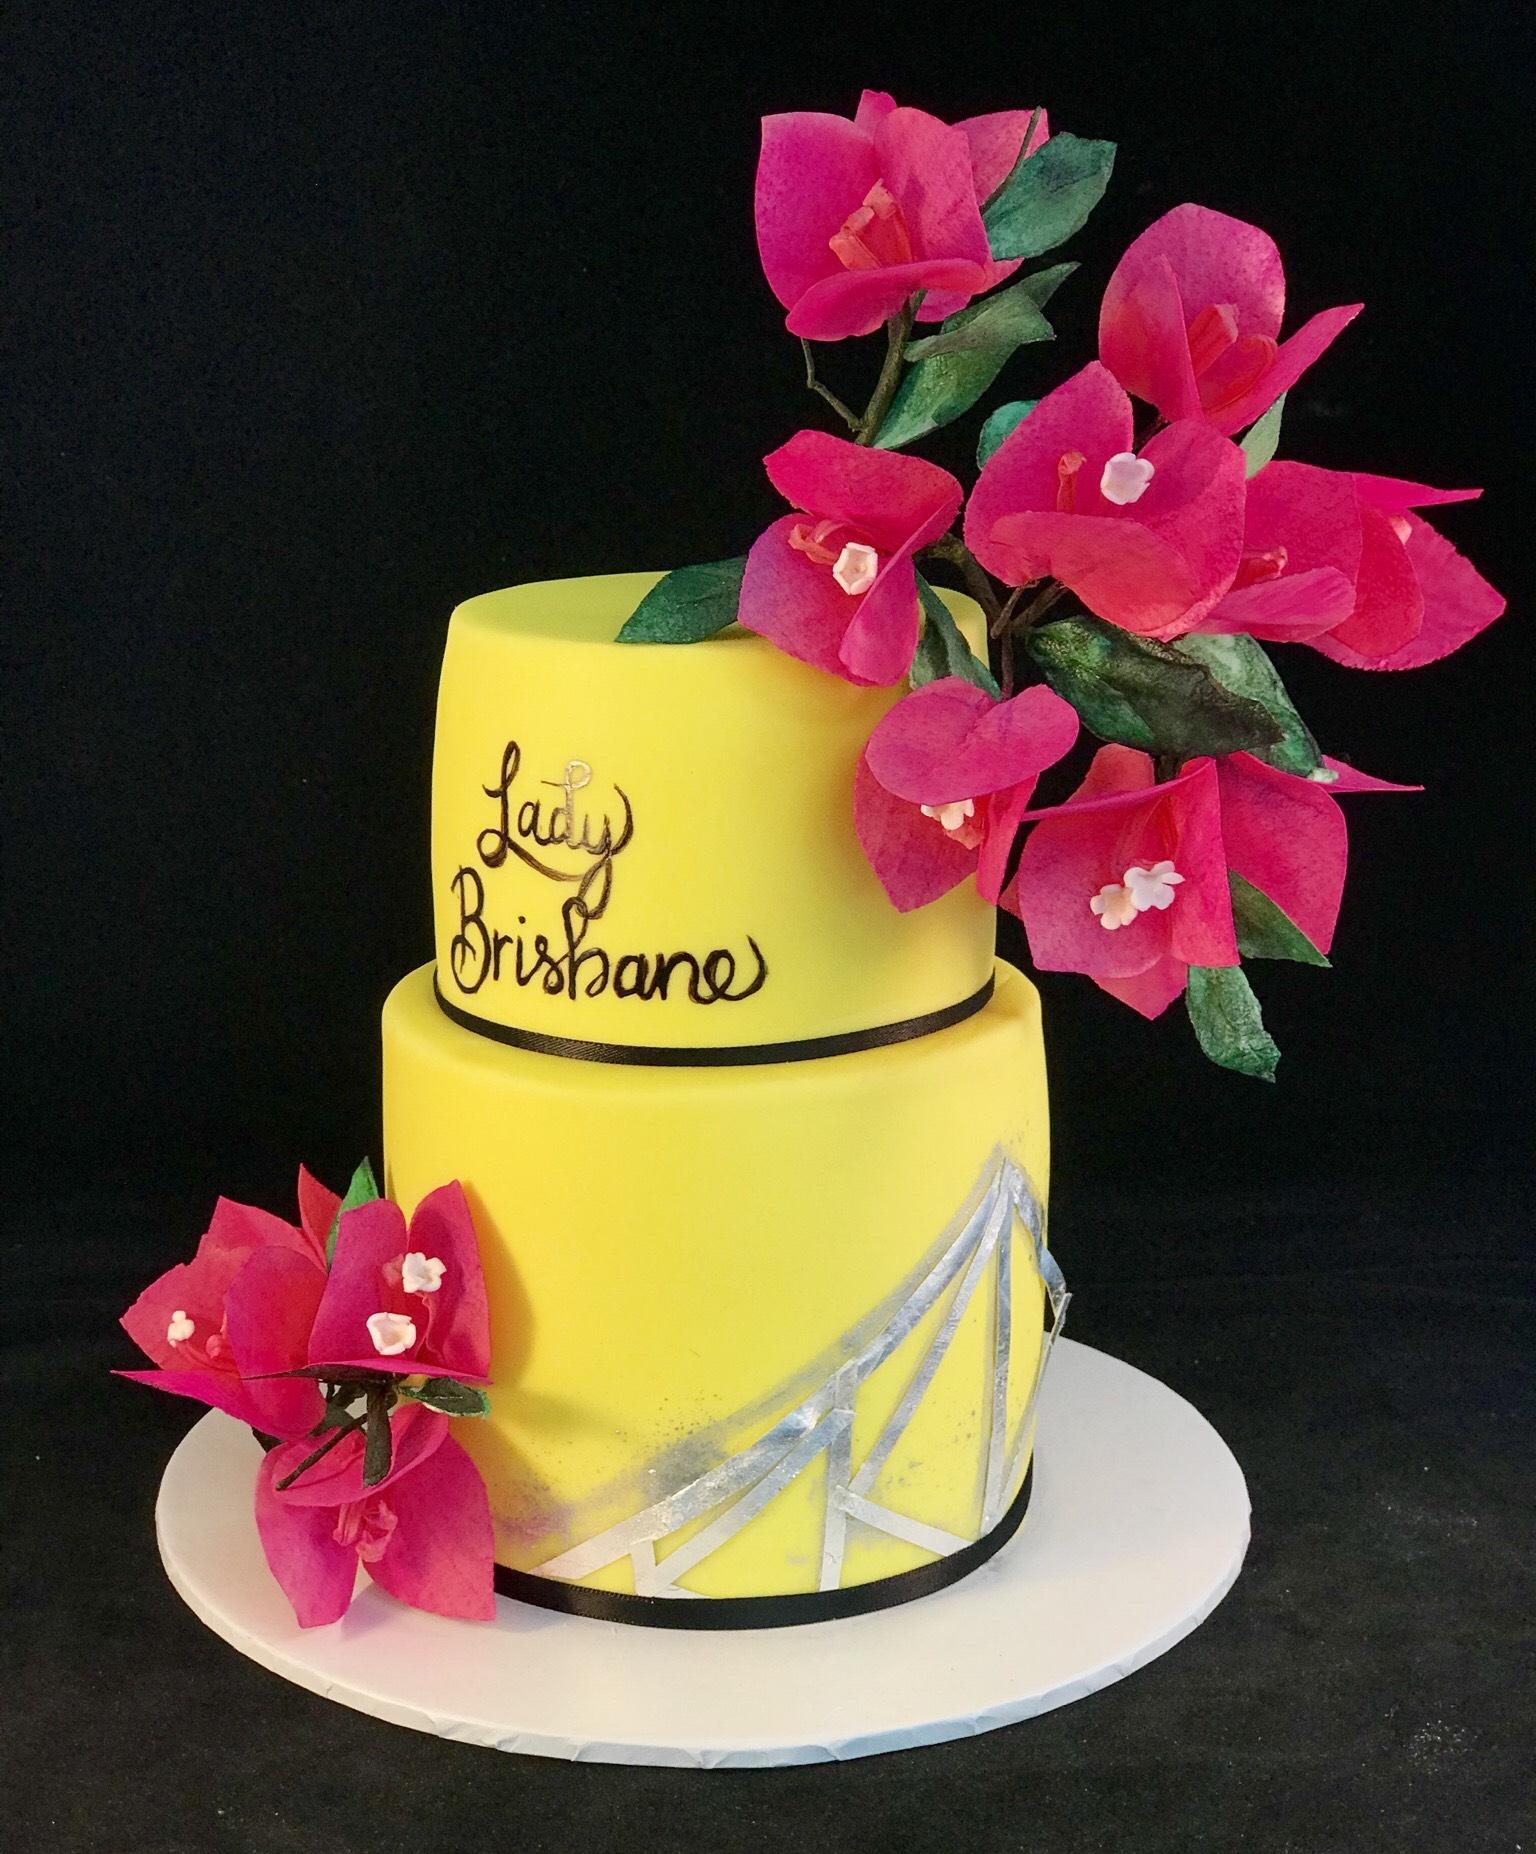 Lady Brisbane International Cake Show Australia